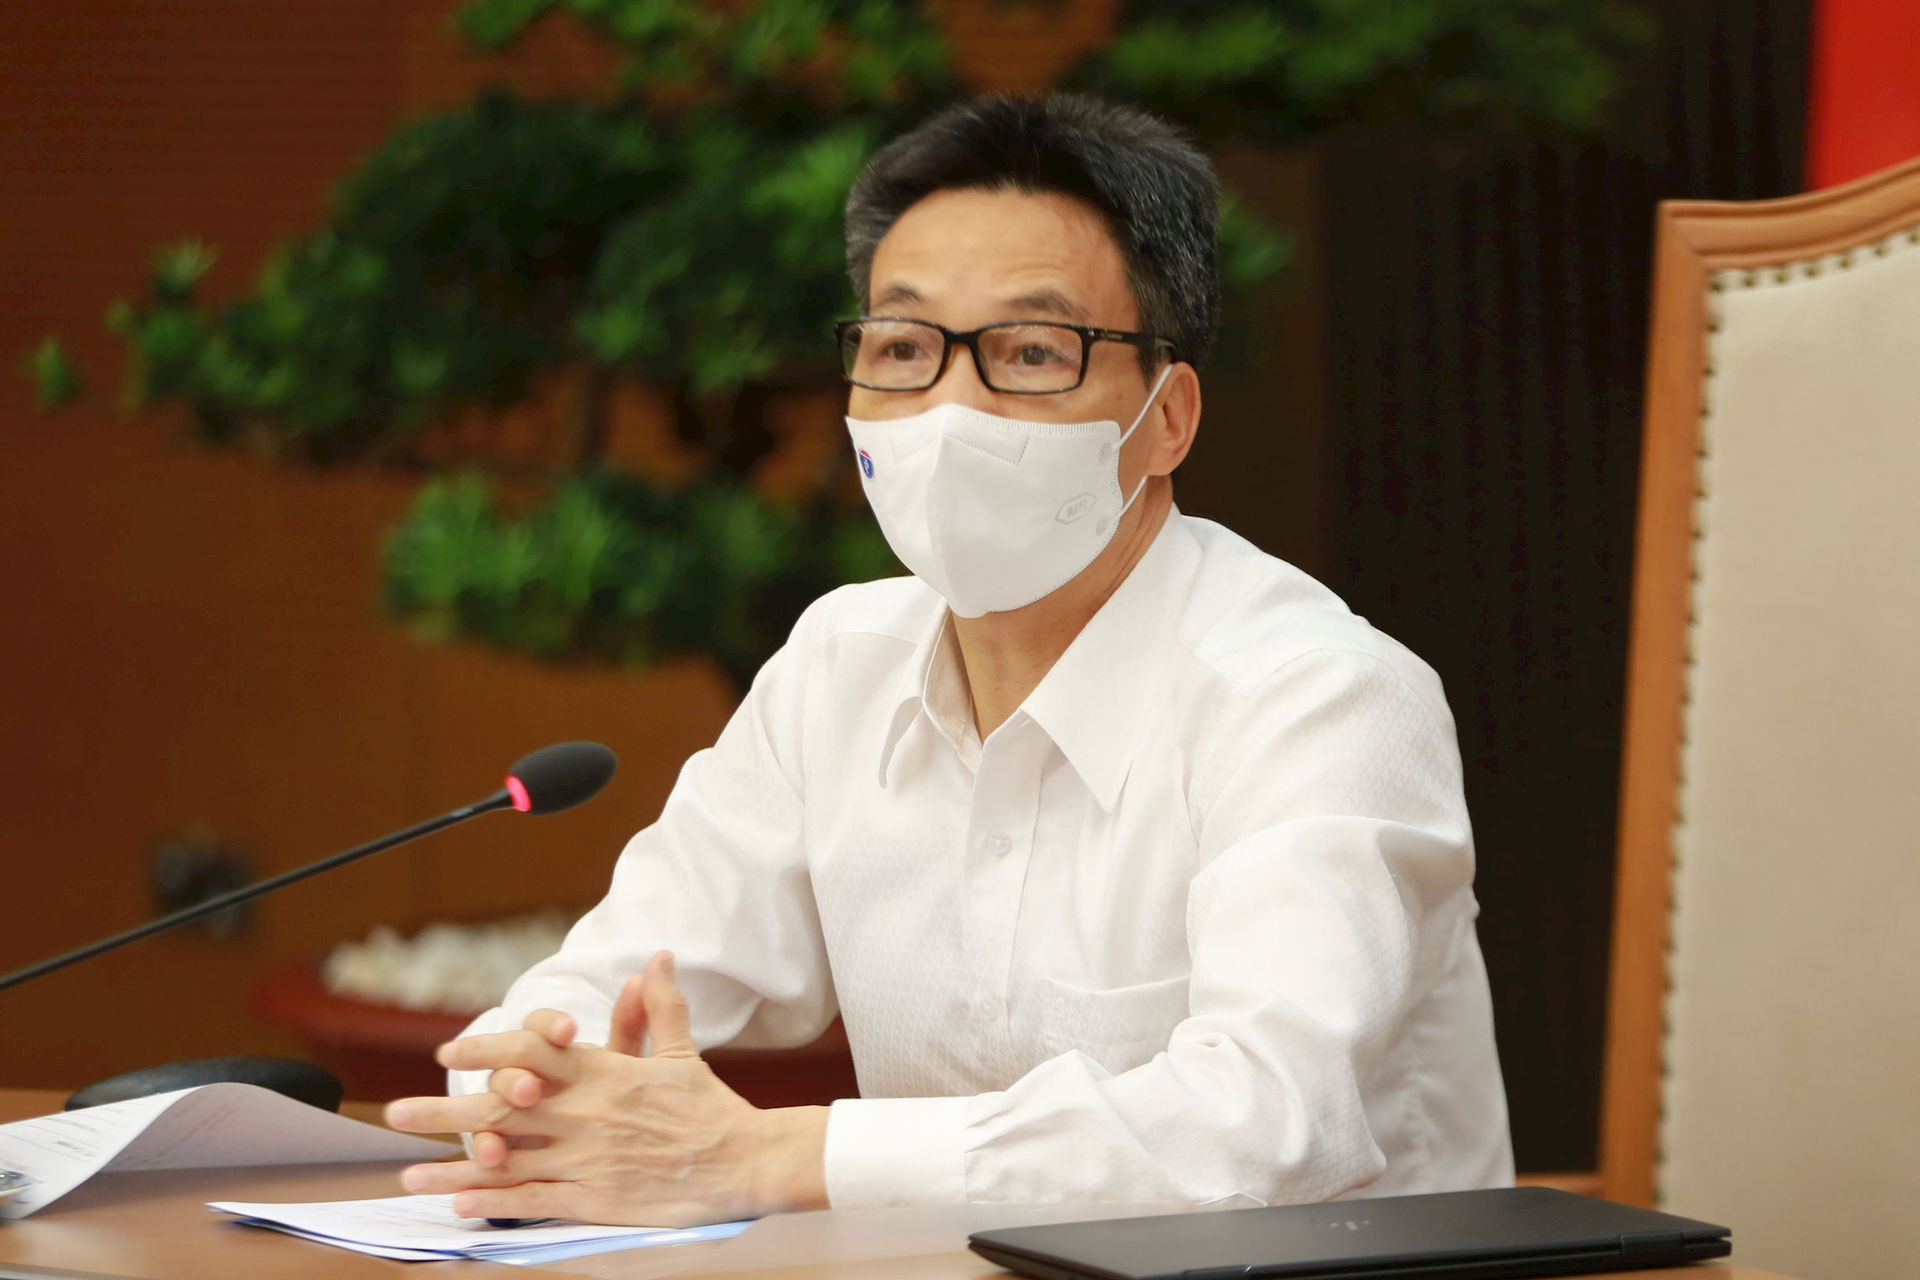 viet-nam-co-ban-chu-dong-duoc-vaccine-thuoc-dieu-tri-sinh-pham-chuyen-trang-thai.jpg